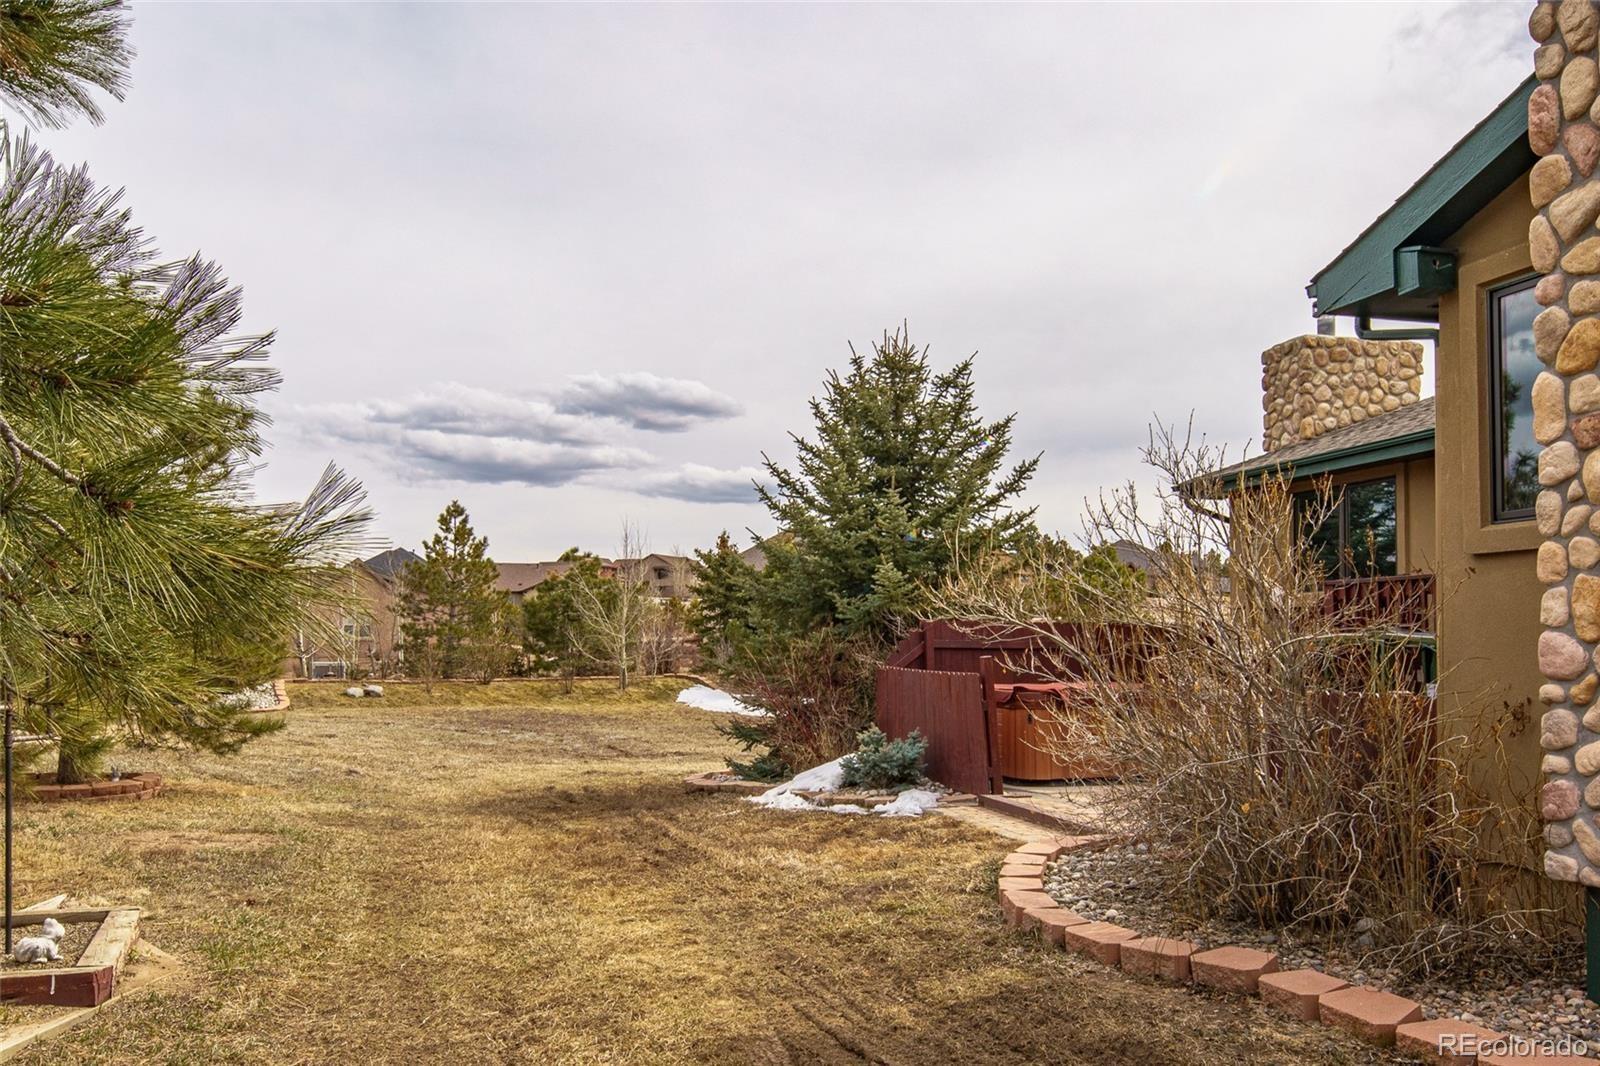 MLS# 9205685 - 38 - 17720 Pioneer Crossing, Colorado Springs, CO 80908